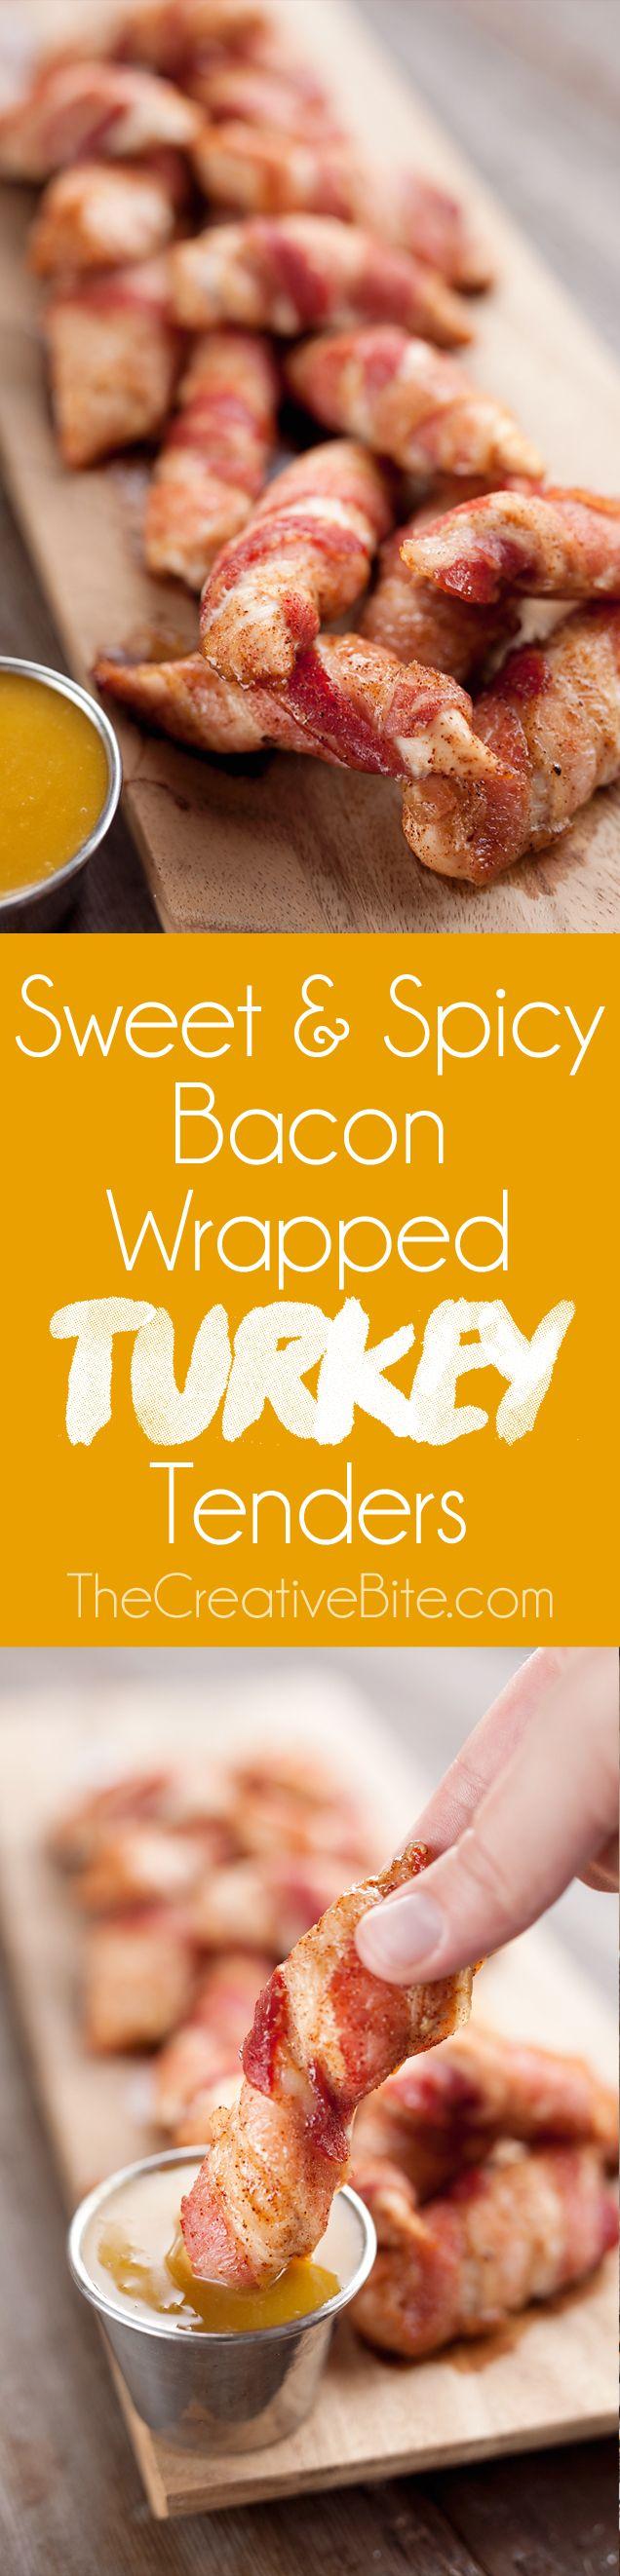 Sweet & Spicy Bacon Wrapped Turkey Tenders